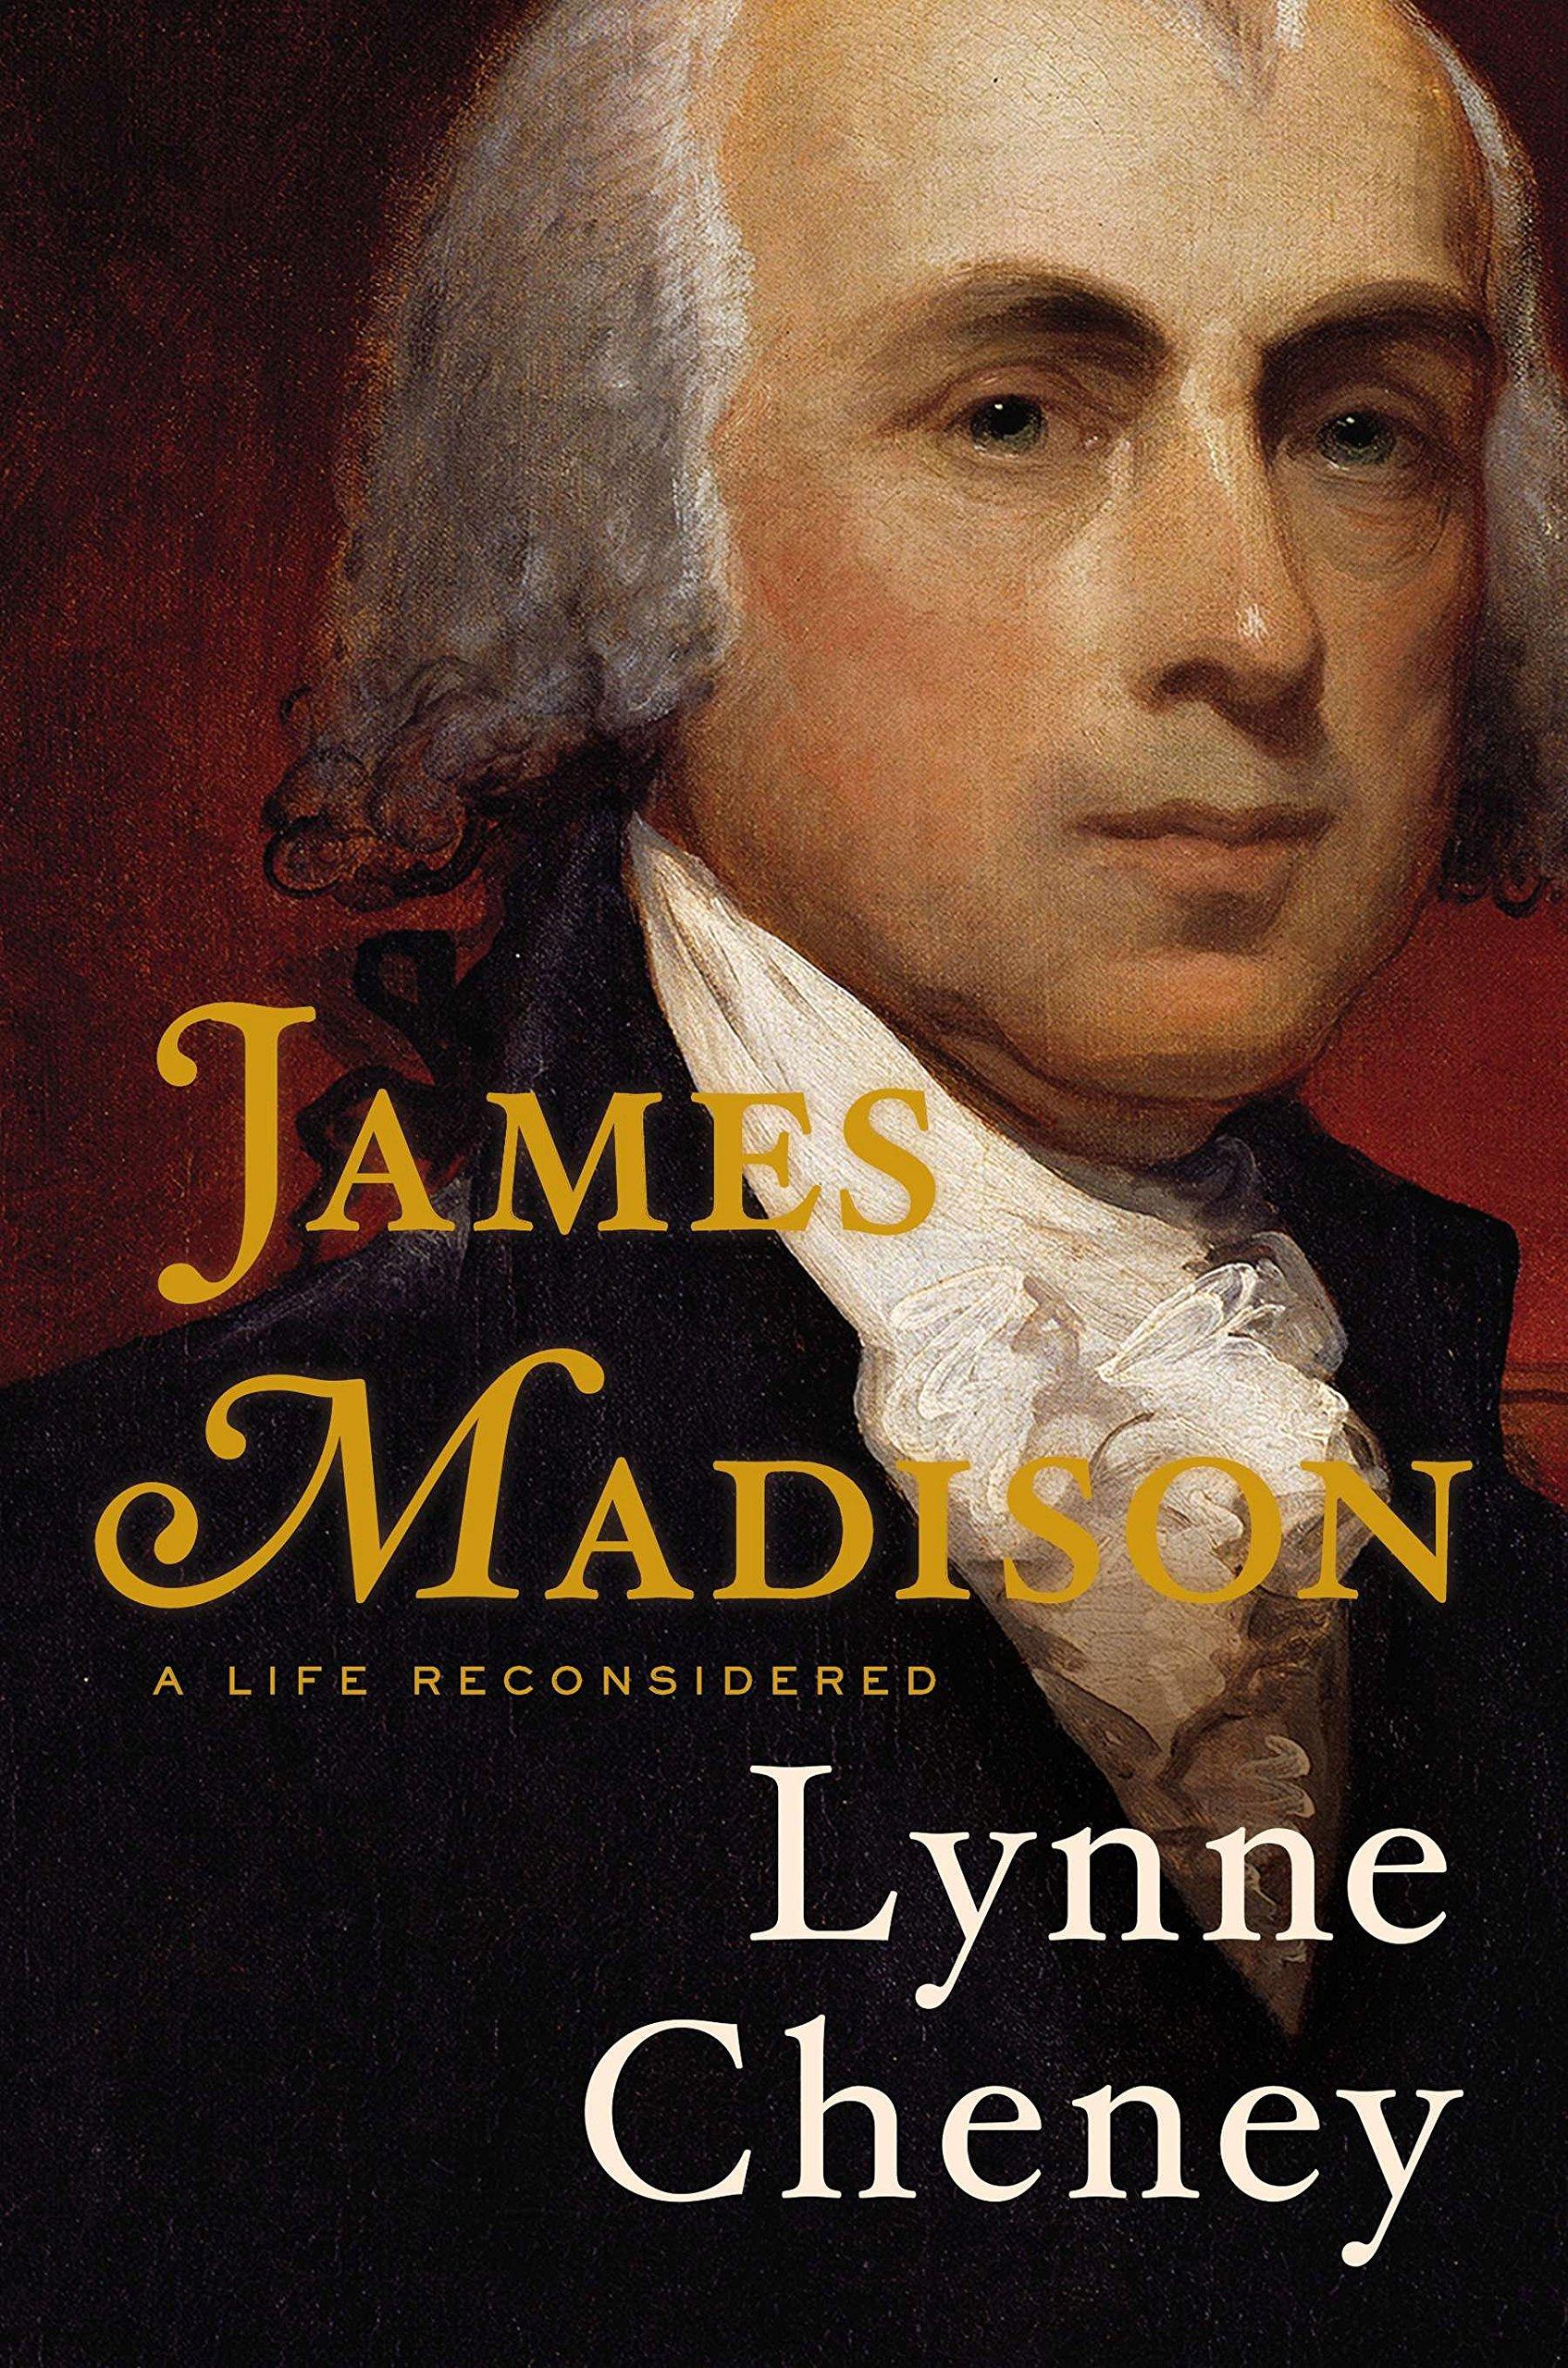 Amazon Com James Madison A Life Reconsidered 9780670025190 Cheney Lynne Books